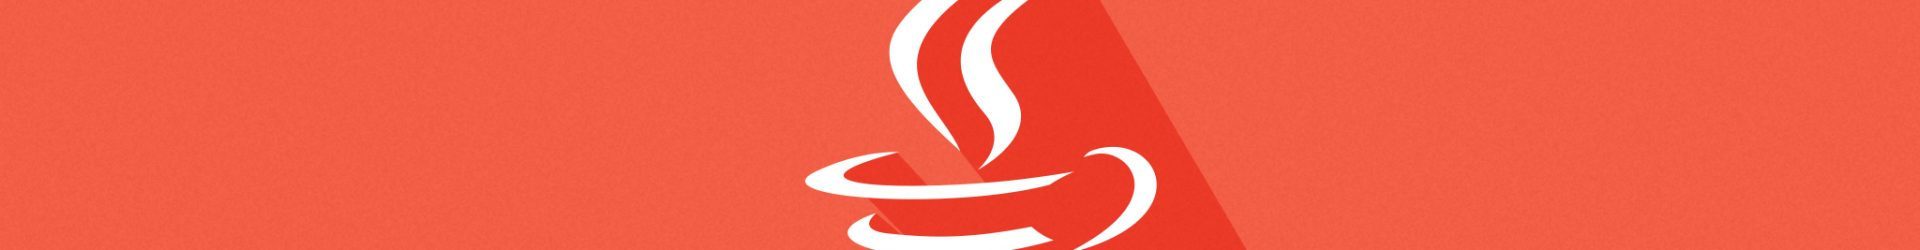 Java, anonymous class (classe anonima)